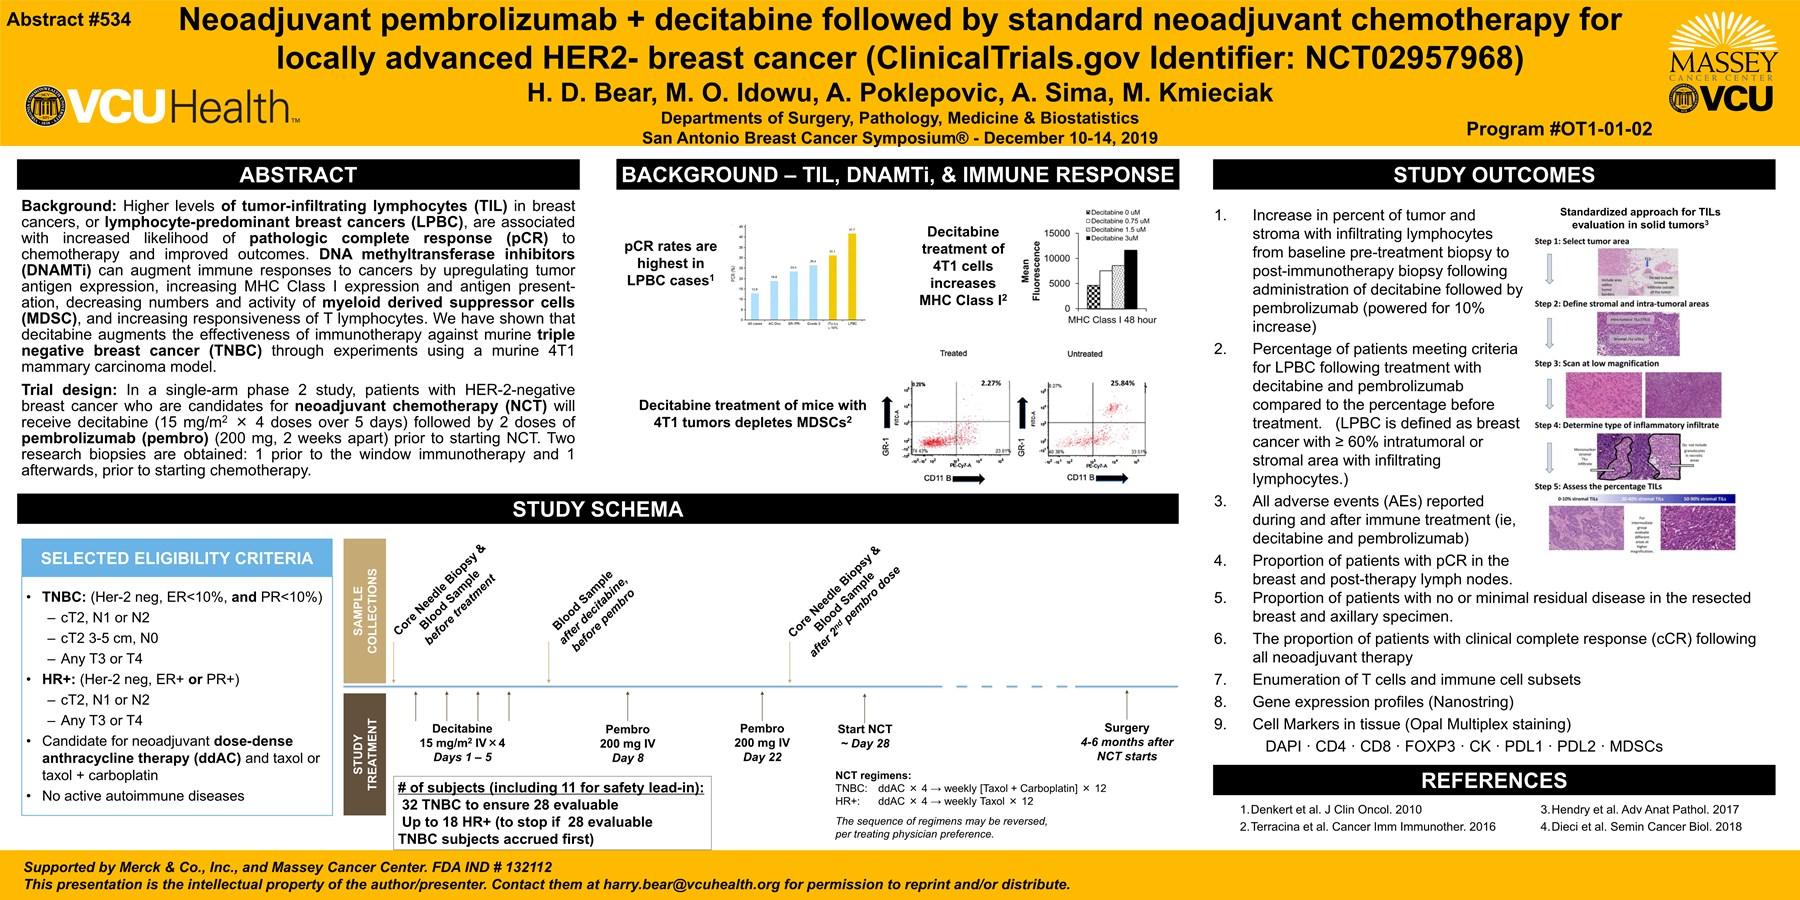 Neoadjuvant pembrolizumab + decitabine followed by standard neoadjuvant chemotherapy for locally advanced HER2-breastcancer